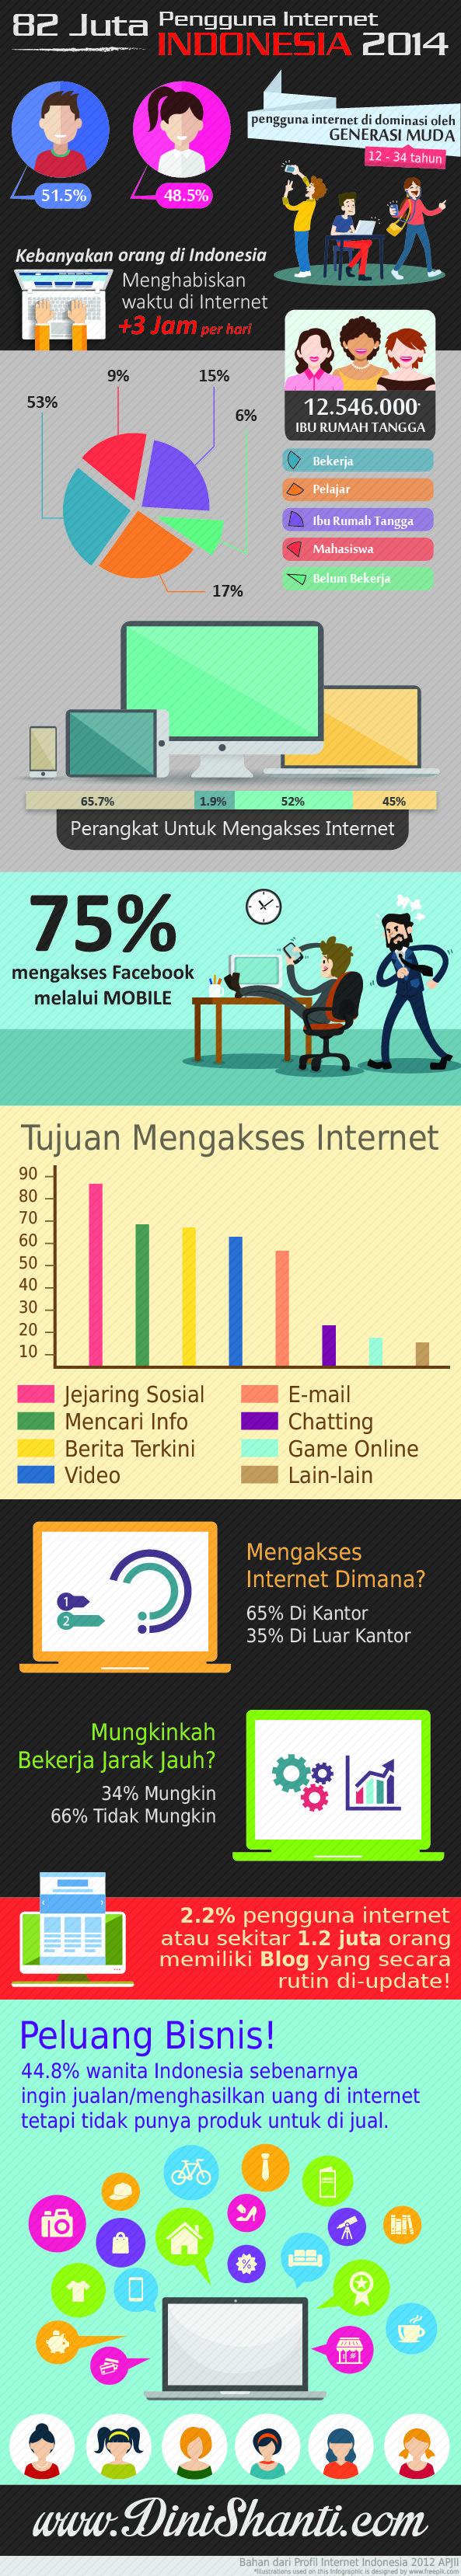 Infografis pengguna internet indonesia 2014.